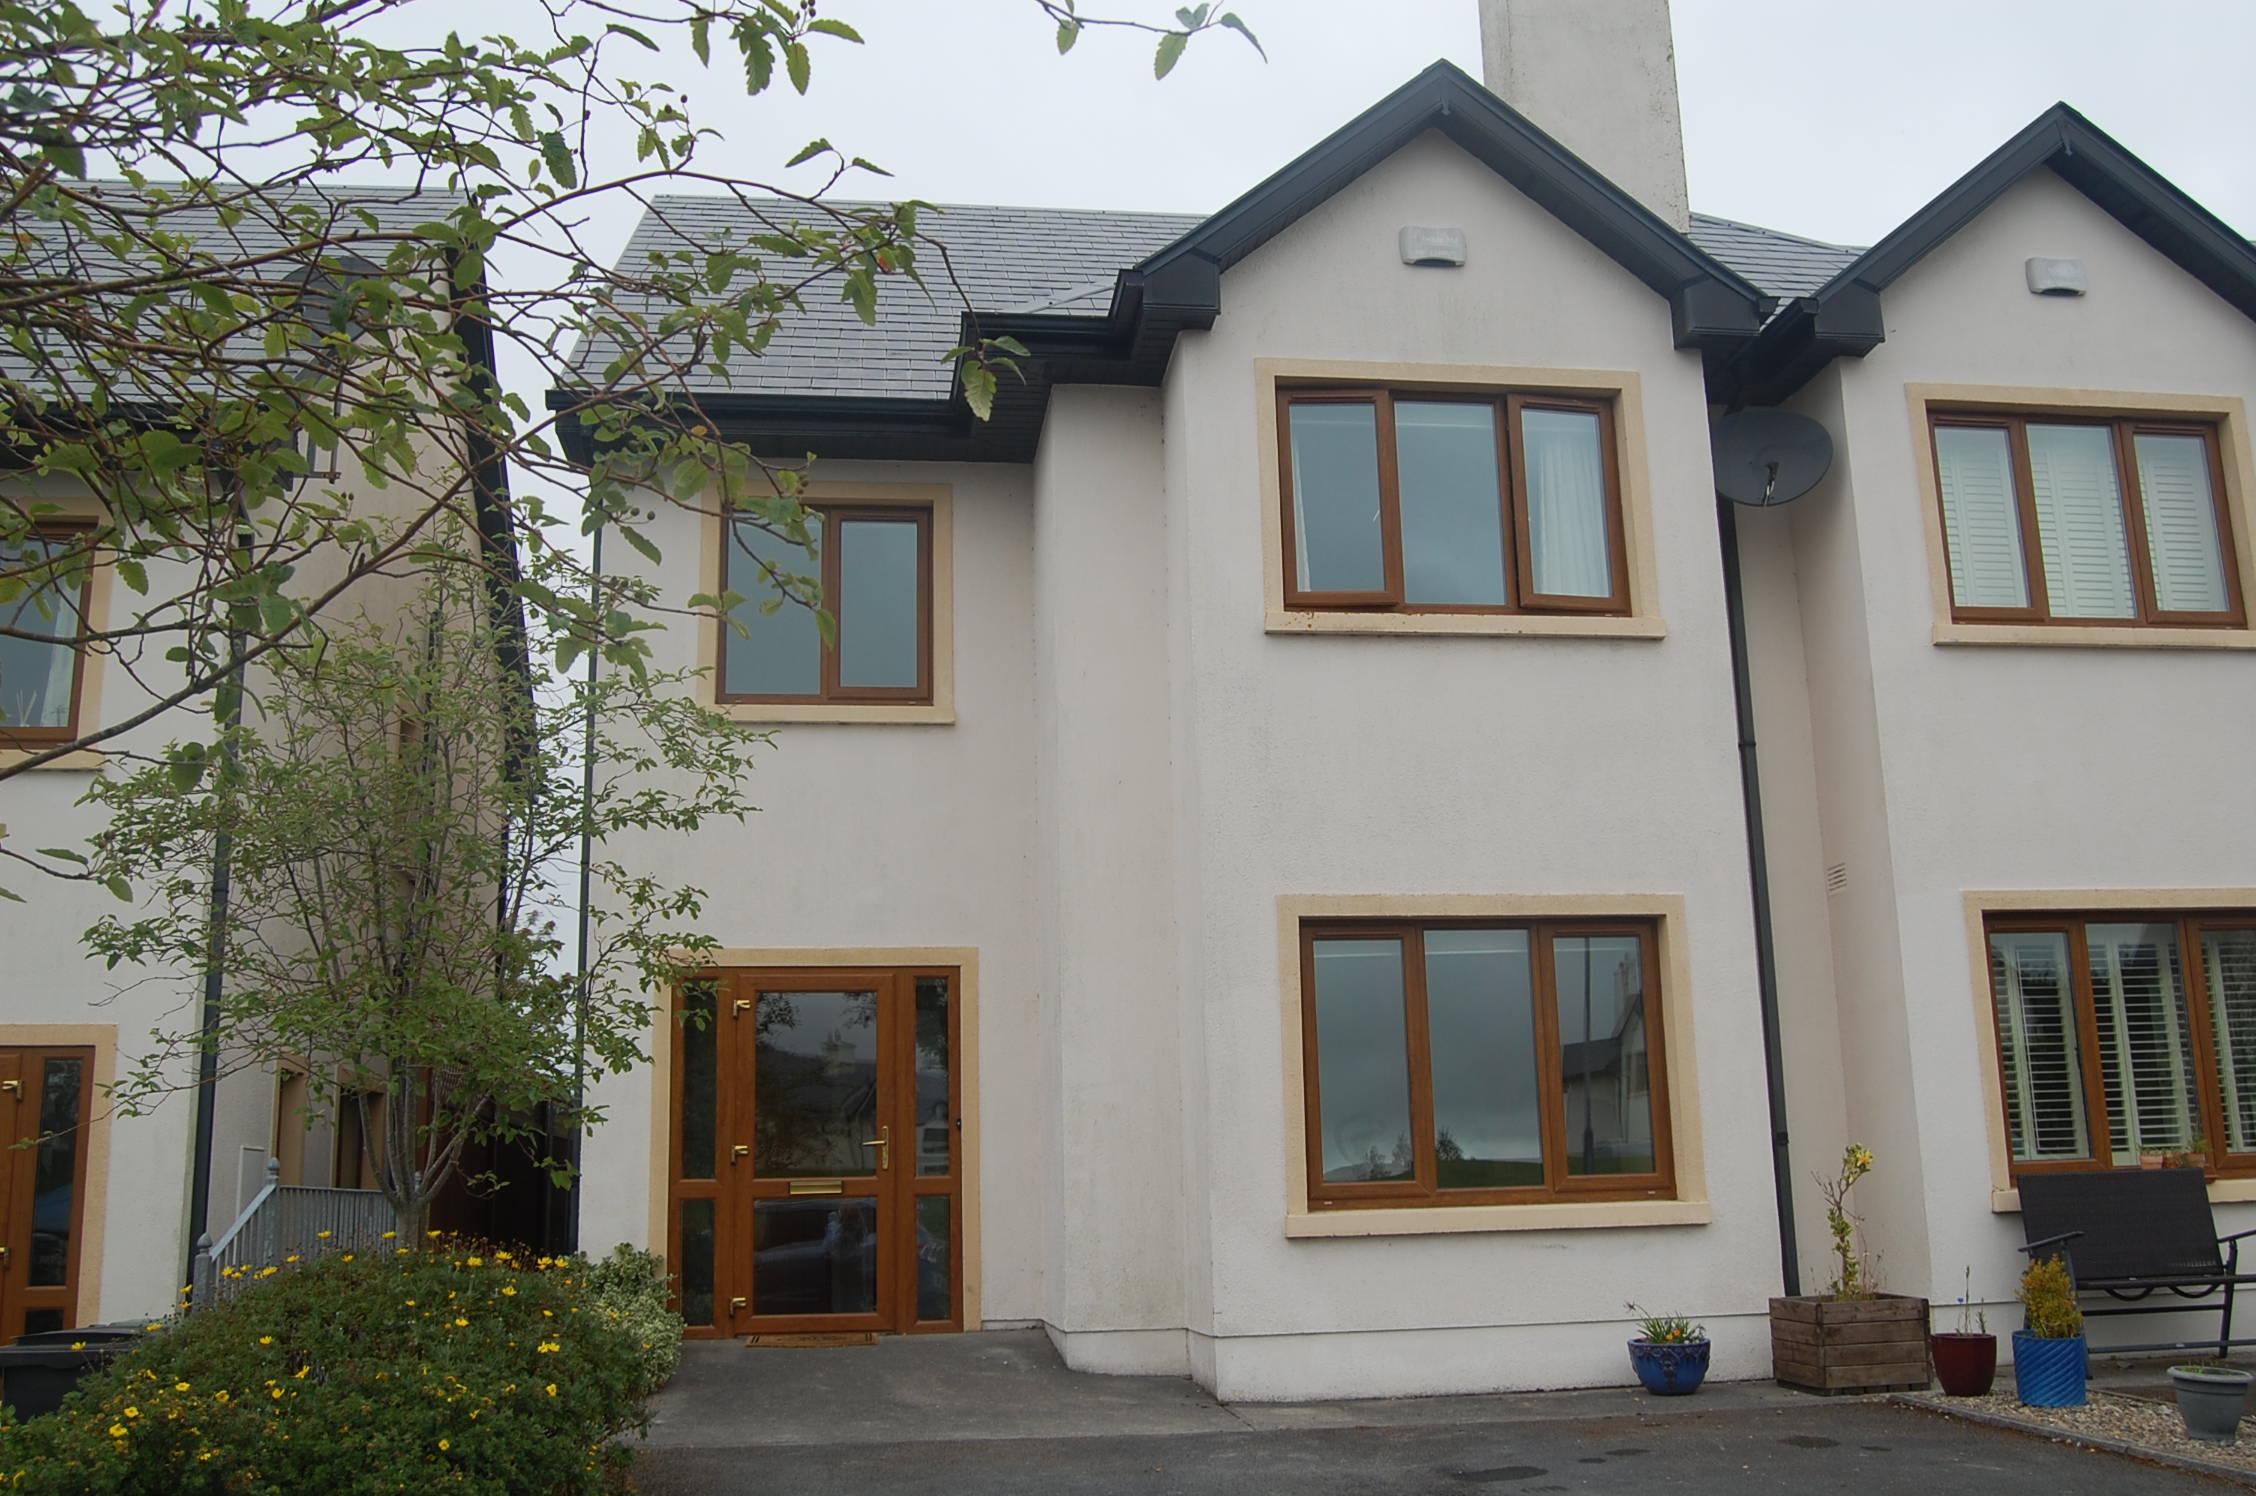 28 Ash Haven, Oranmore, Co. Galway Eircode: H91 KT1D